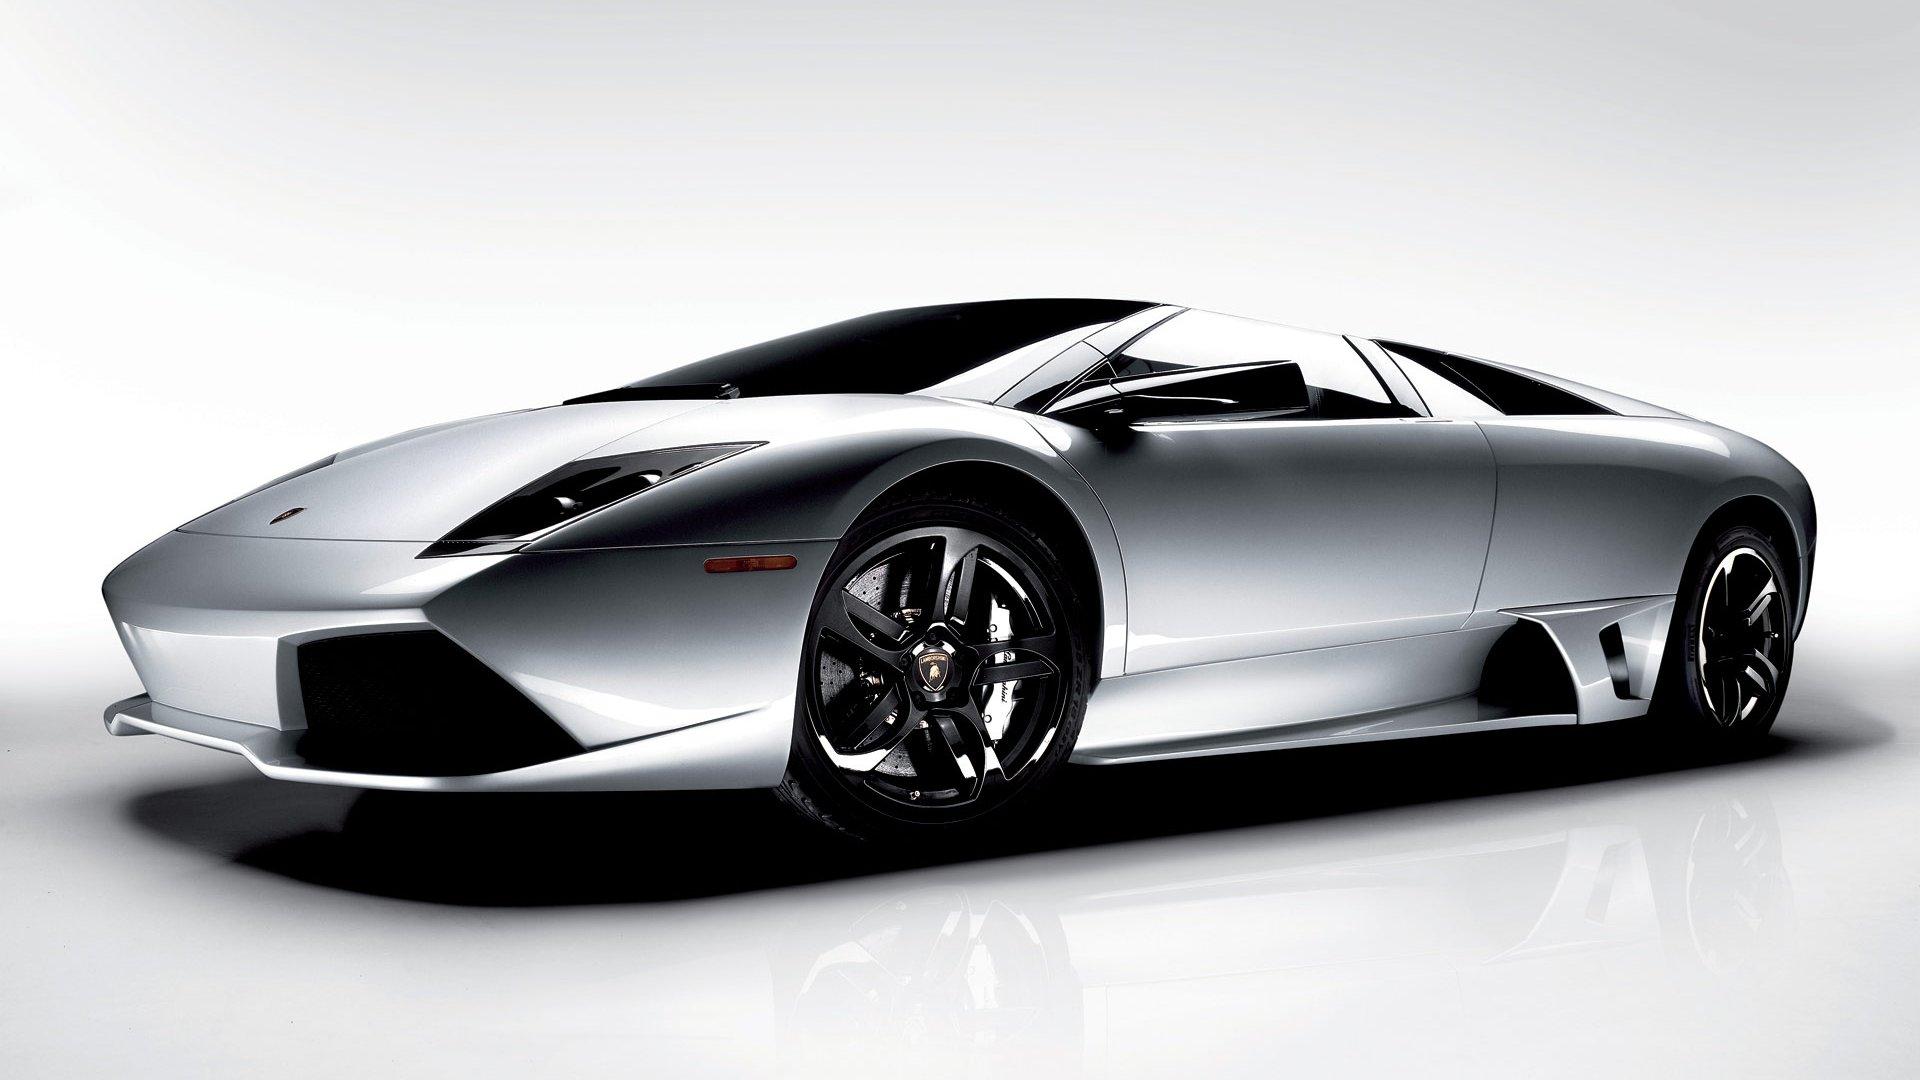 Awesome Lamborghini Murcielago Free Background ID:155313 For Full Hd 1080p  PC